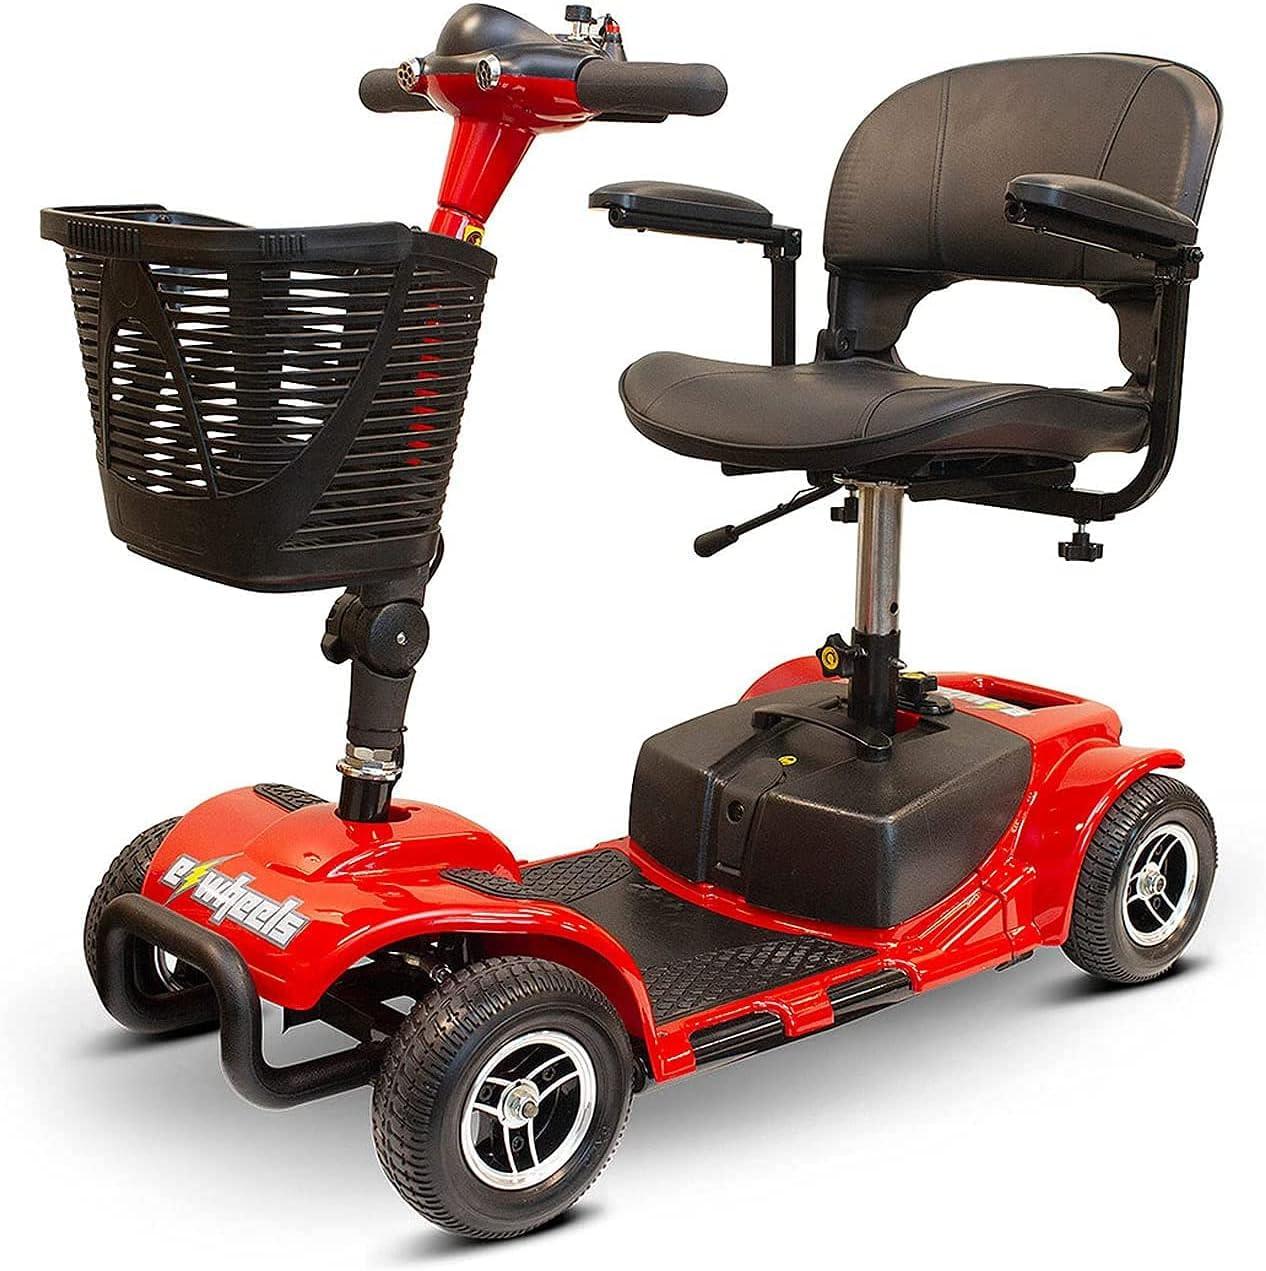 EWheels EW-M34 4-Wheel Foldable Portable Travel sale Ele Sales for sale Lightweight